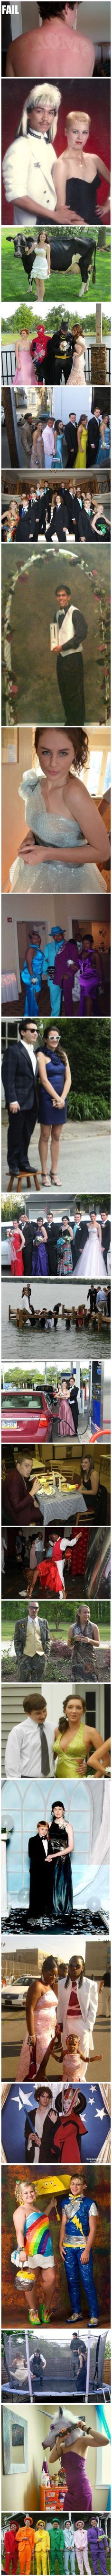 Hilarious prom fails bestfunnyjokes4u.com